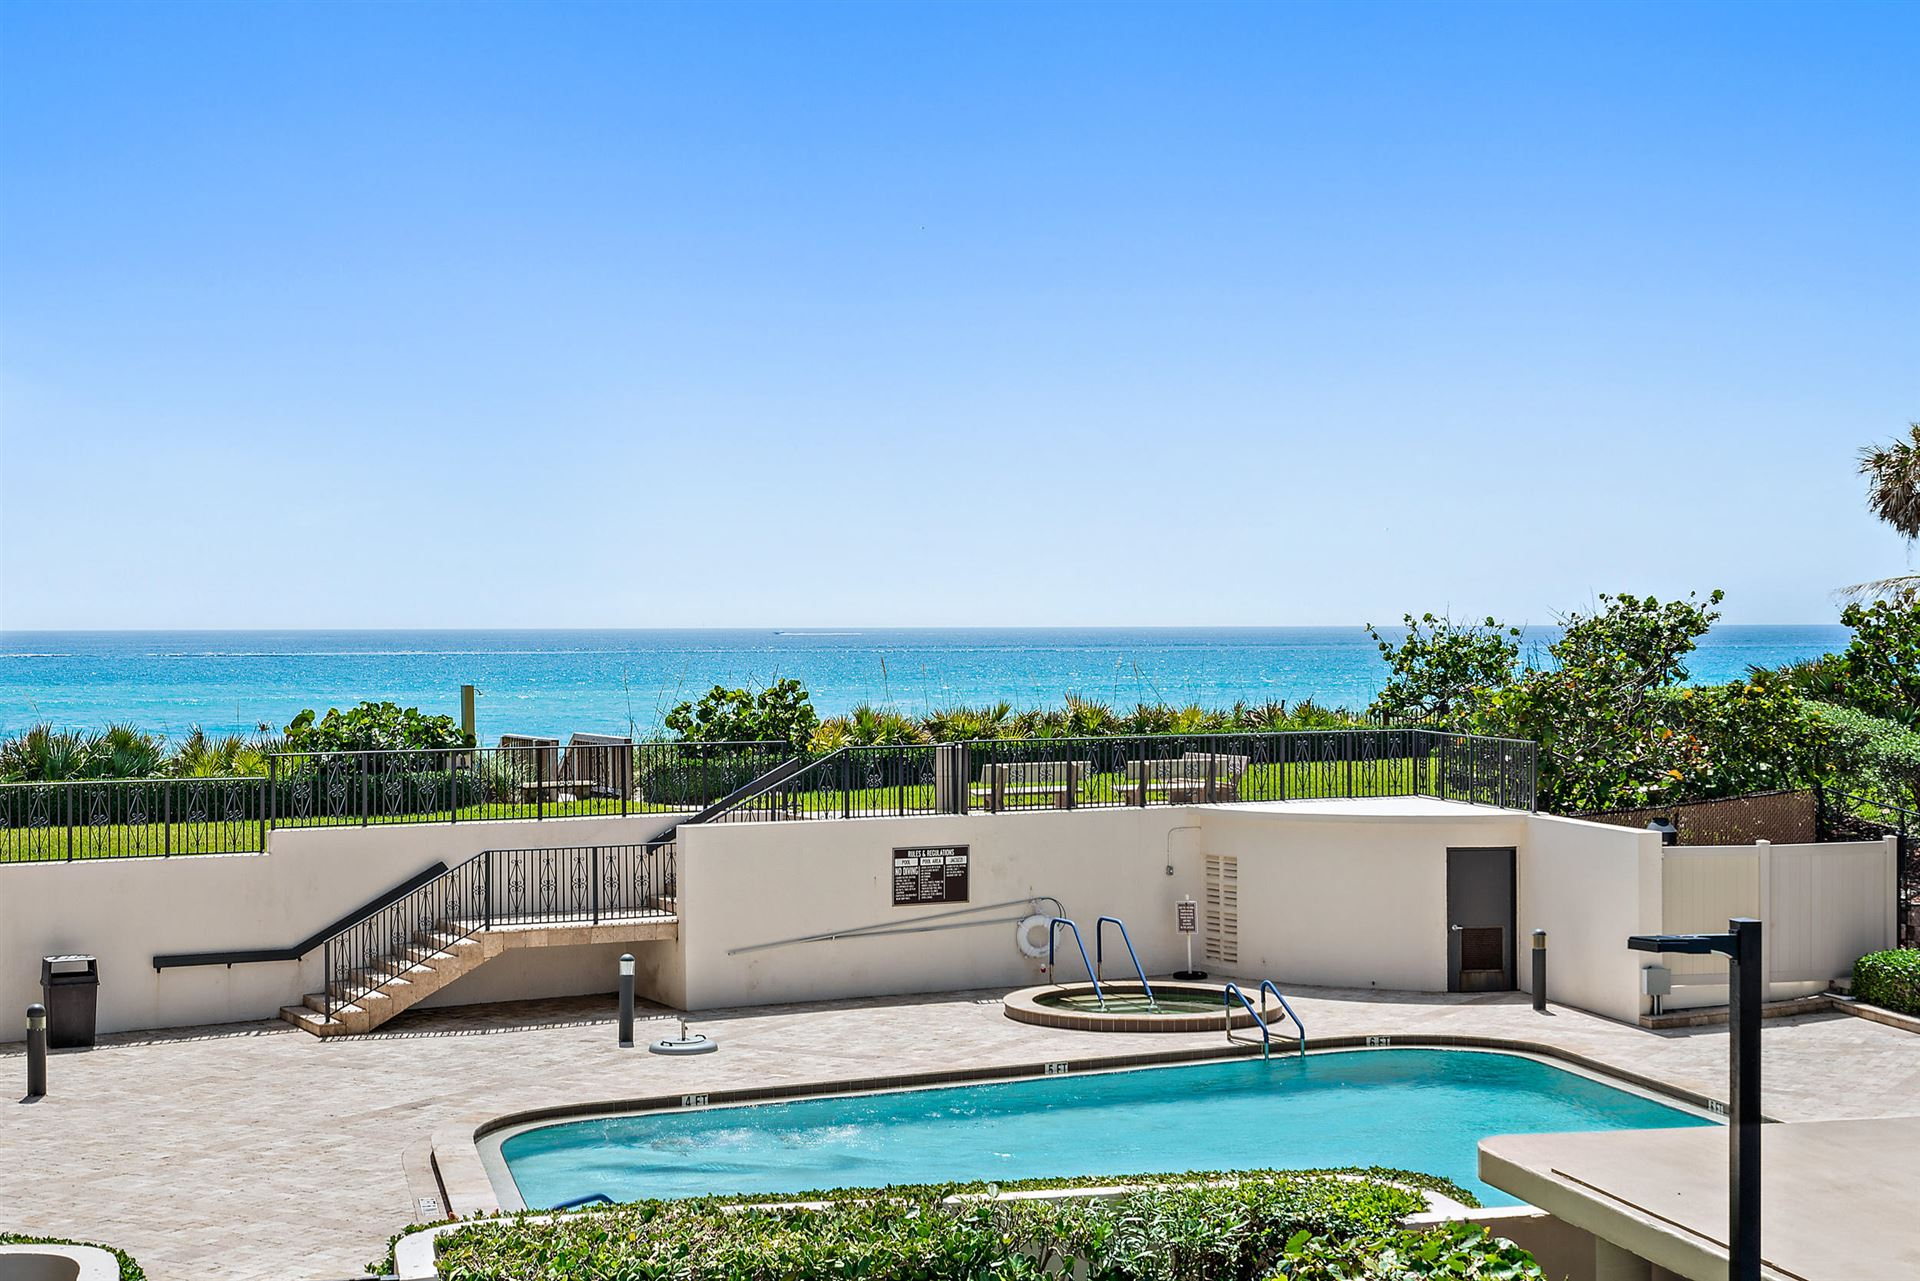 Photo of 5380 N Ocean Drive #2-B, Riviera Beach, FL 33404 (MLS # RX-10625395)